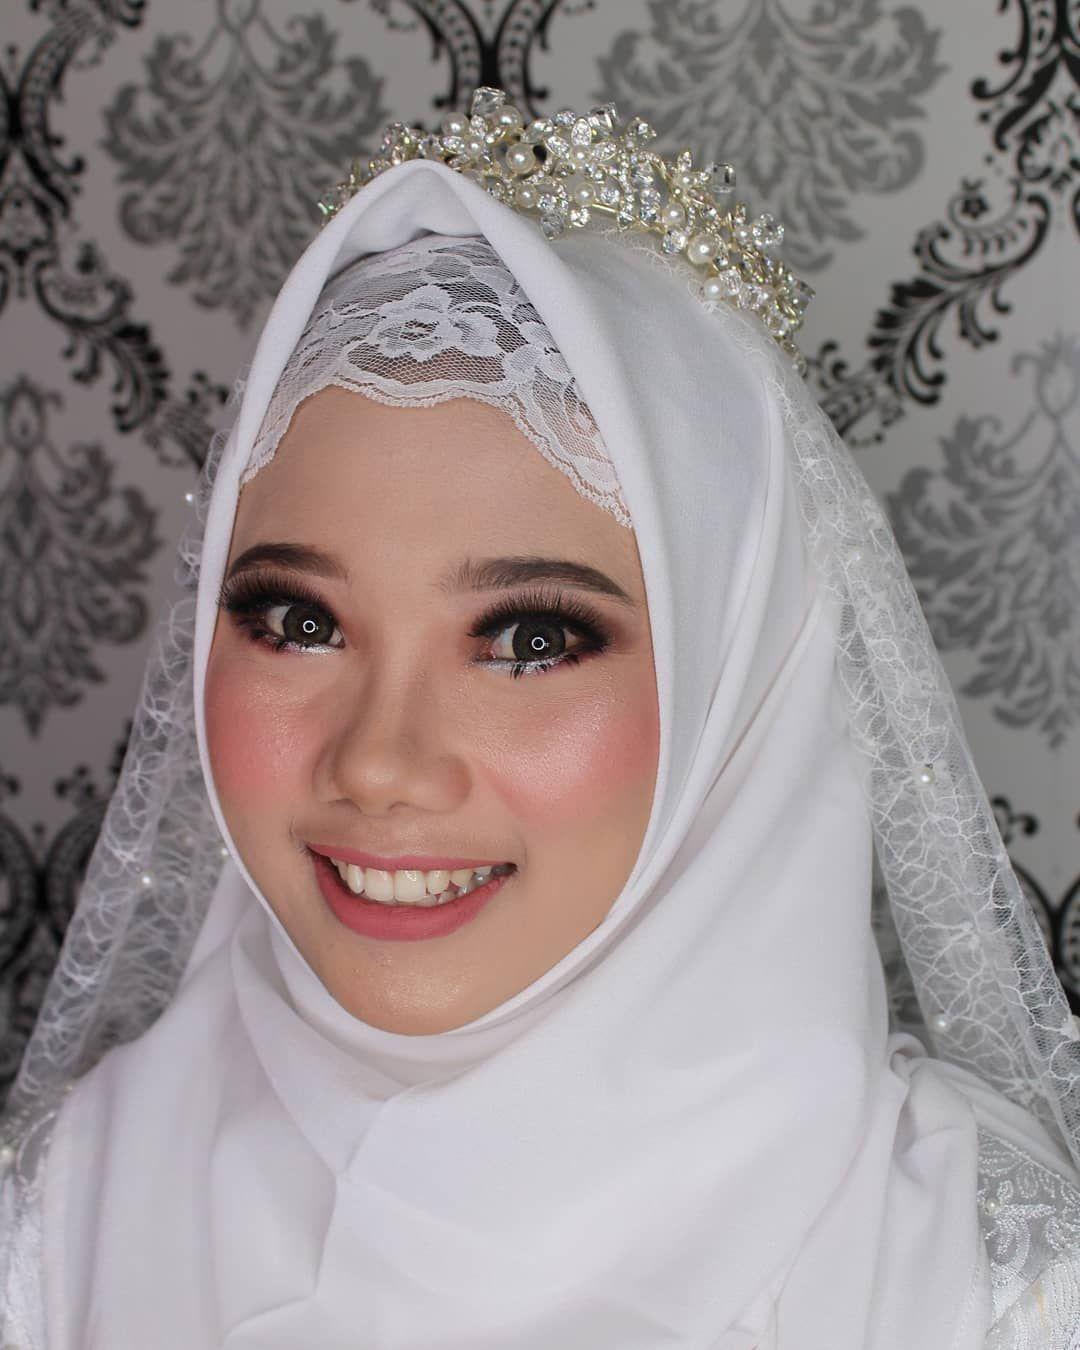 Hasil karya makeup class by w.yulita.m .. . Melayani